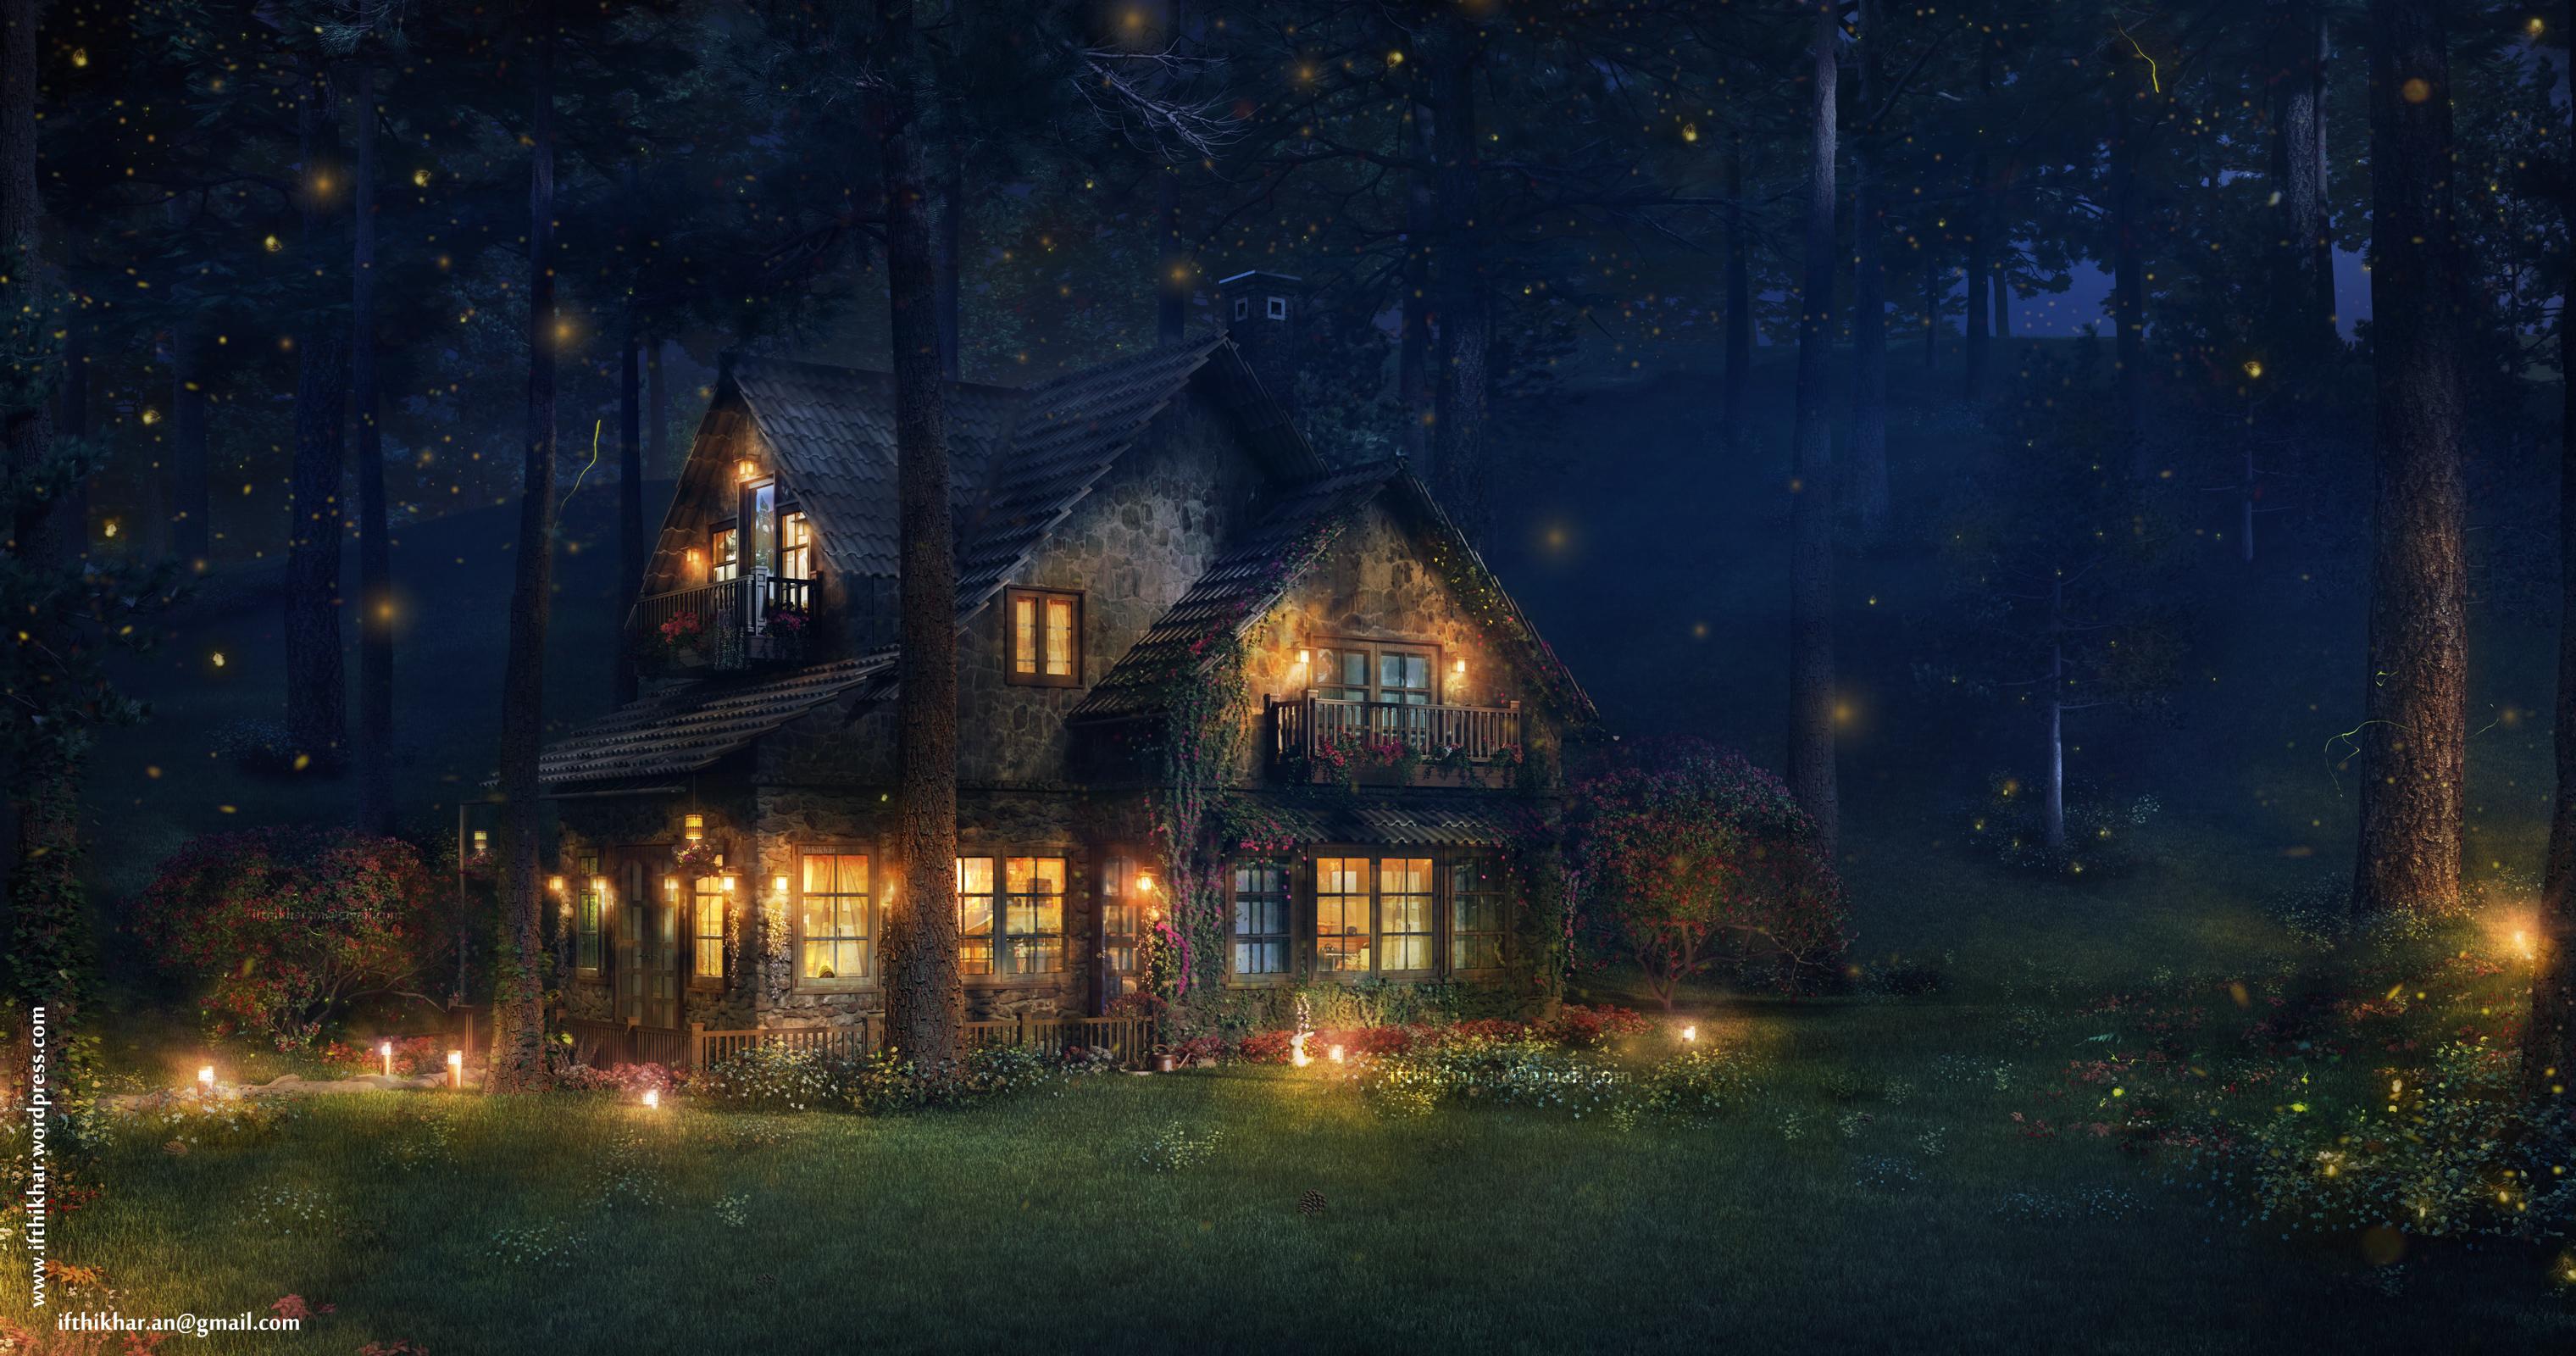 Mountain cottages, storybook style, folkloric, and English Tudor style ...